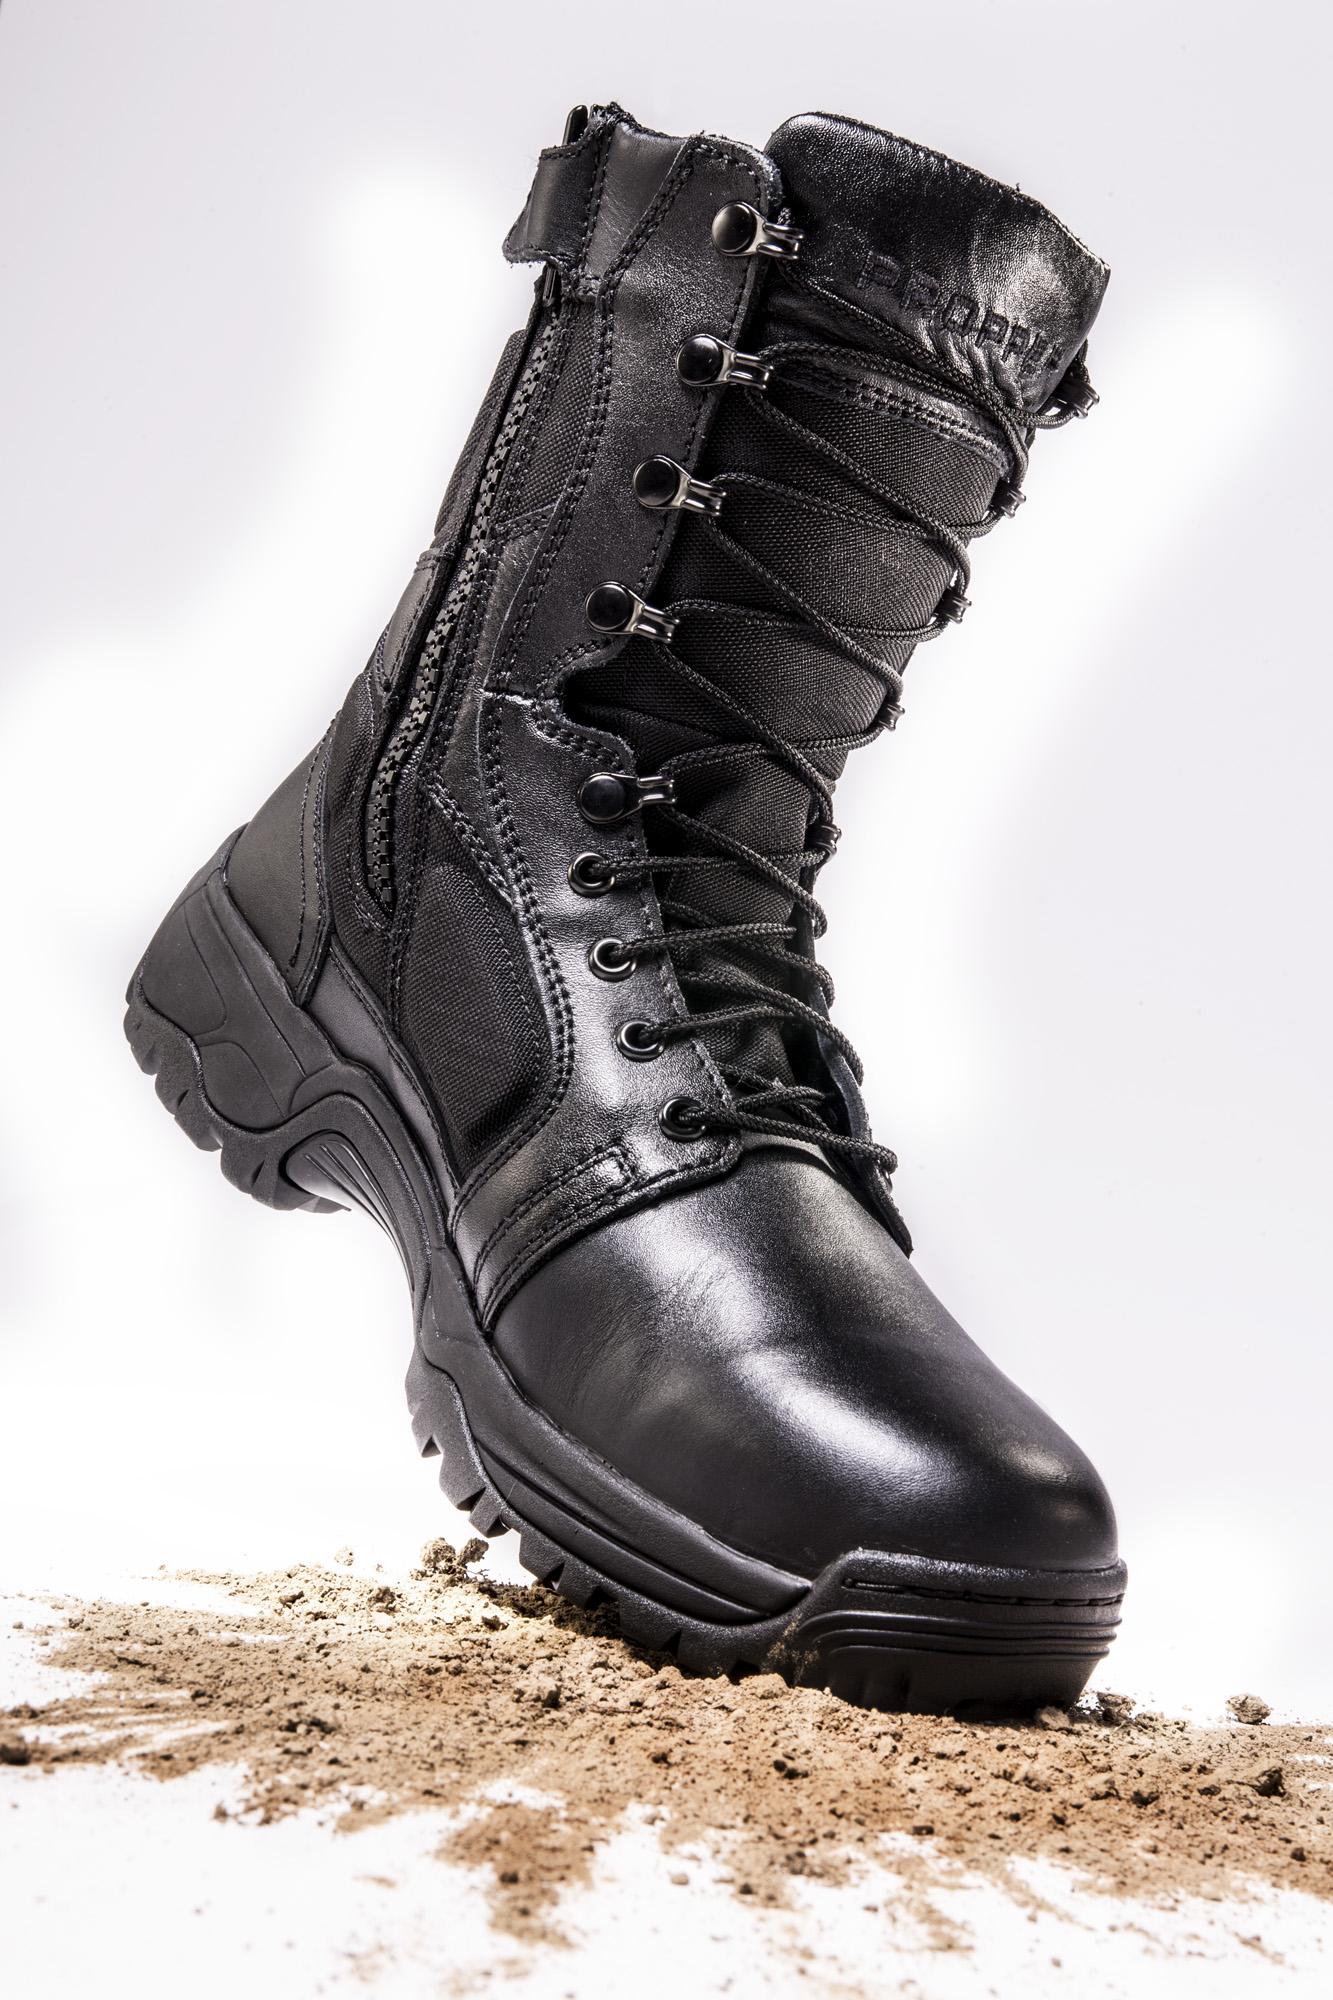 propper boot-446-2 copy.jpg